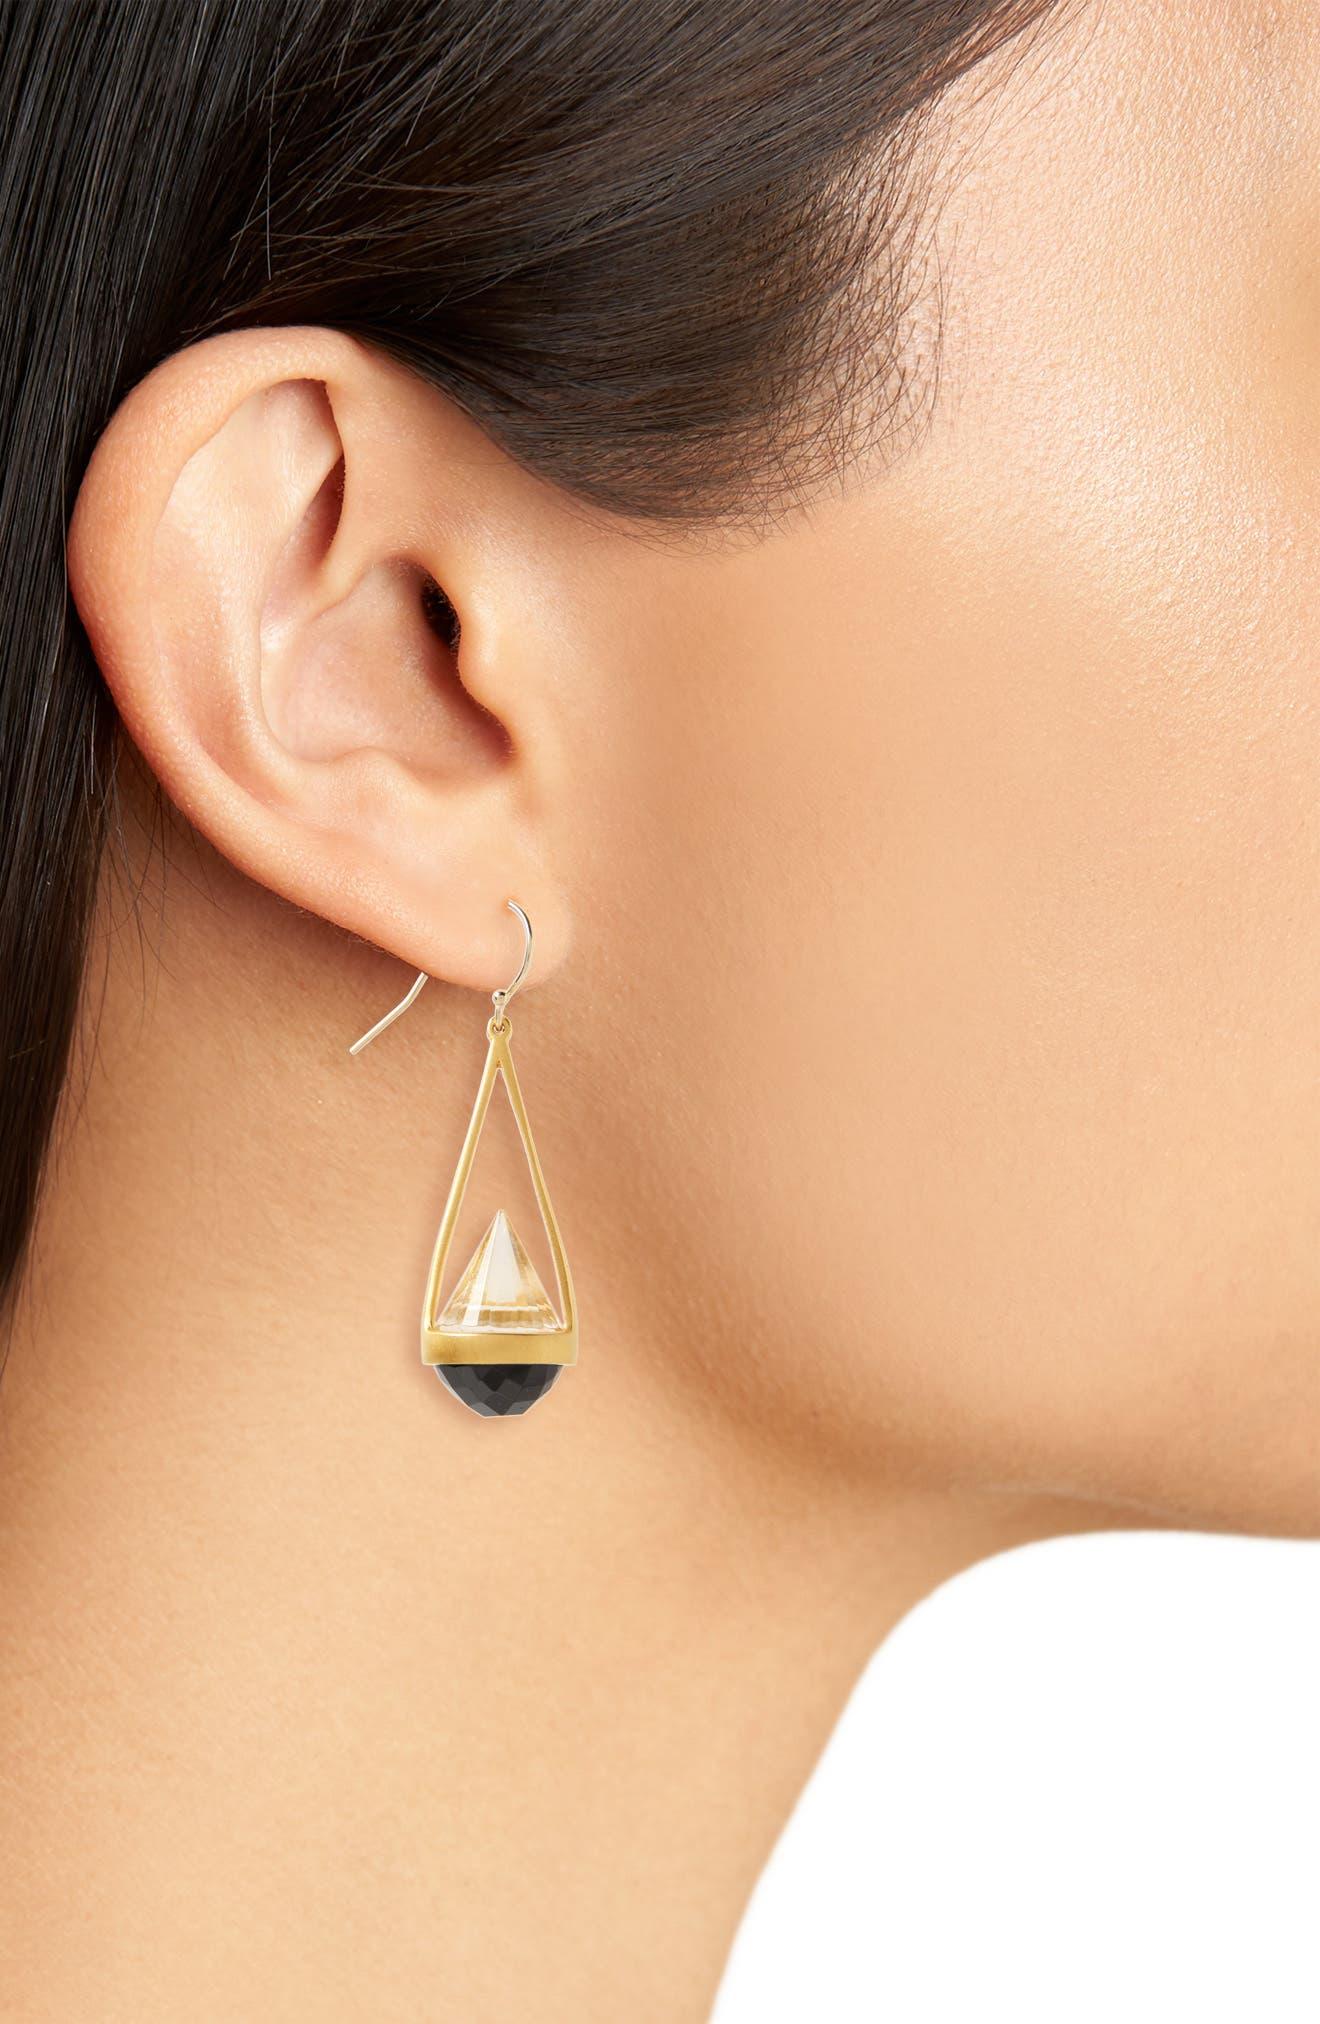 Rio Drop Earrings,                             Alternate thumbnail 2, color,                             Black Onyx/ Gold